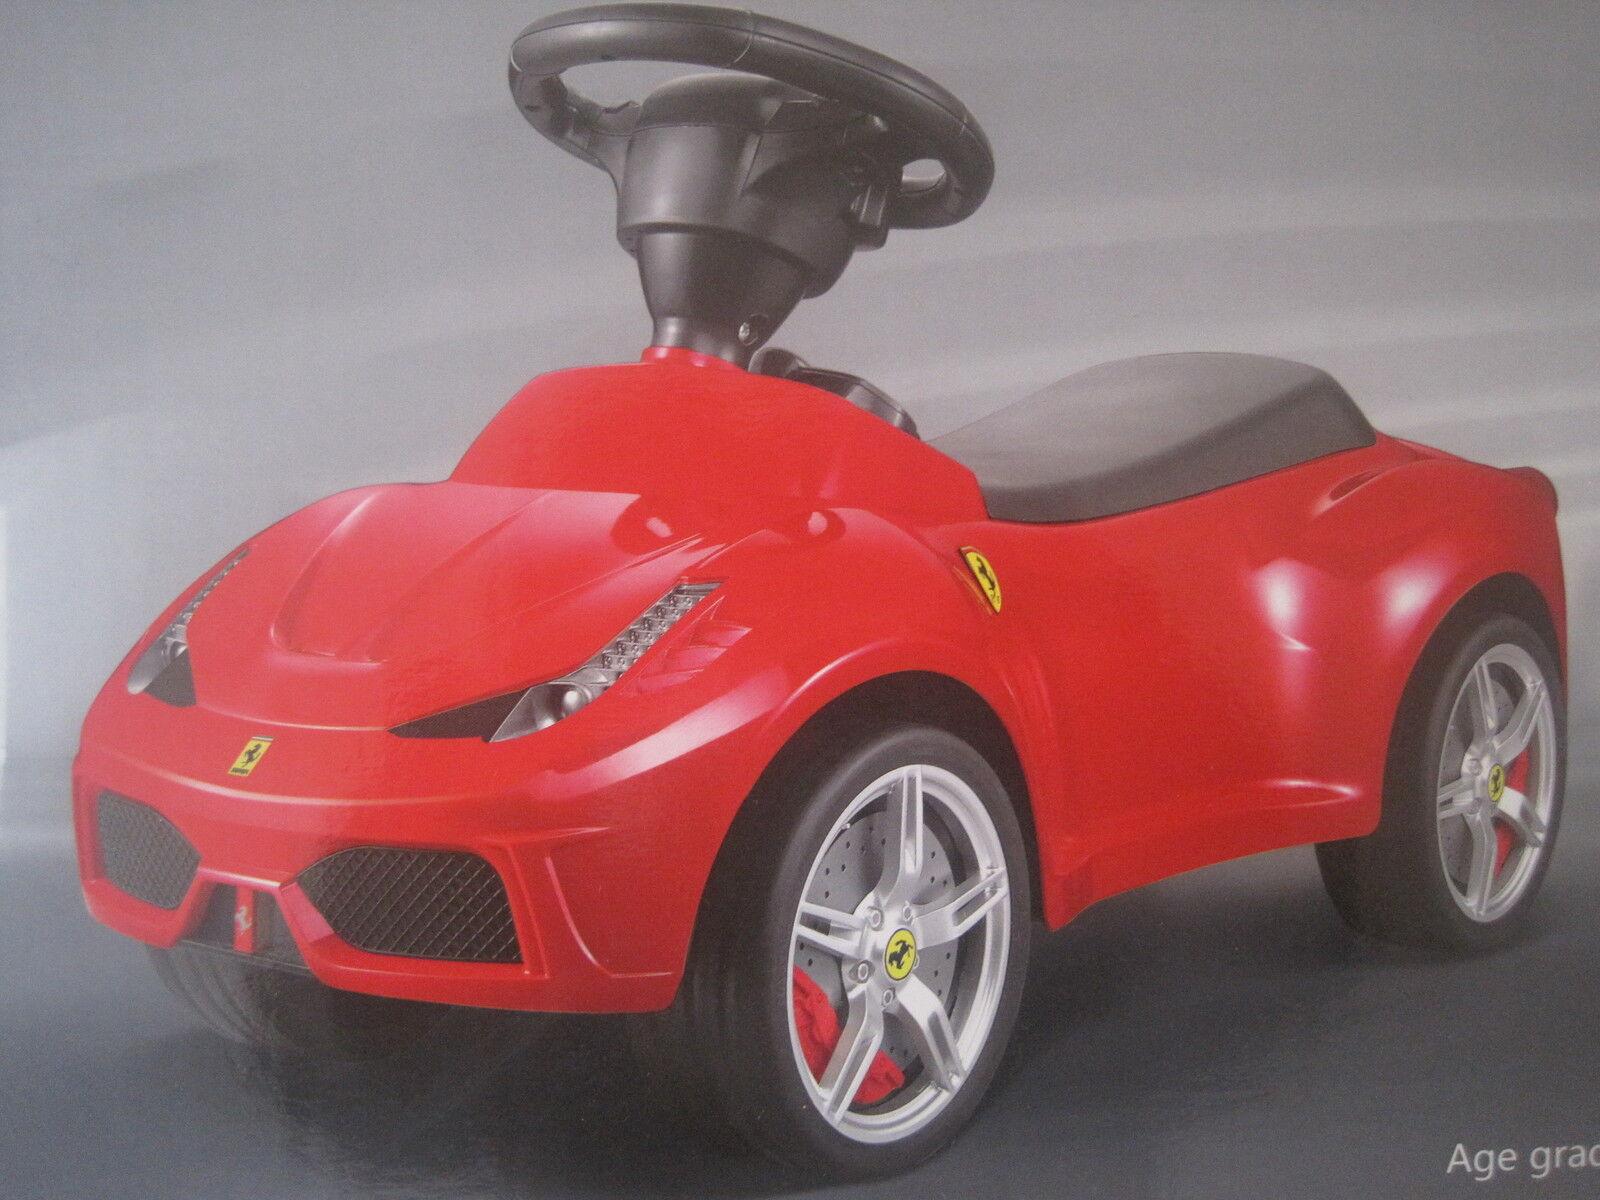 Rutscherauto Lizensiertes Rutscherfahrzeug Ferrari  NEU m. Flüsterreifen